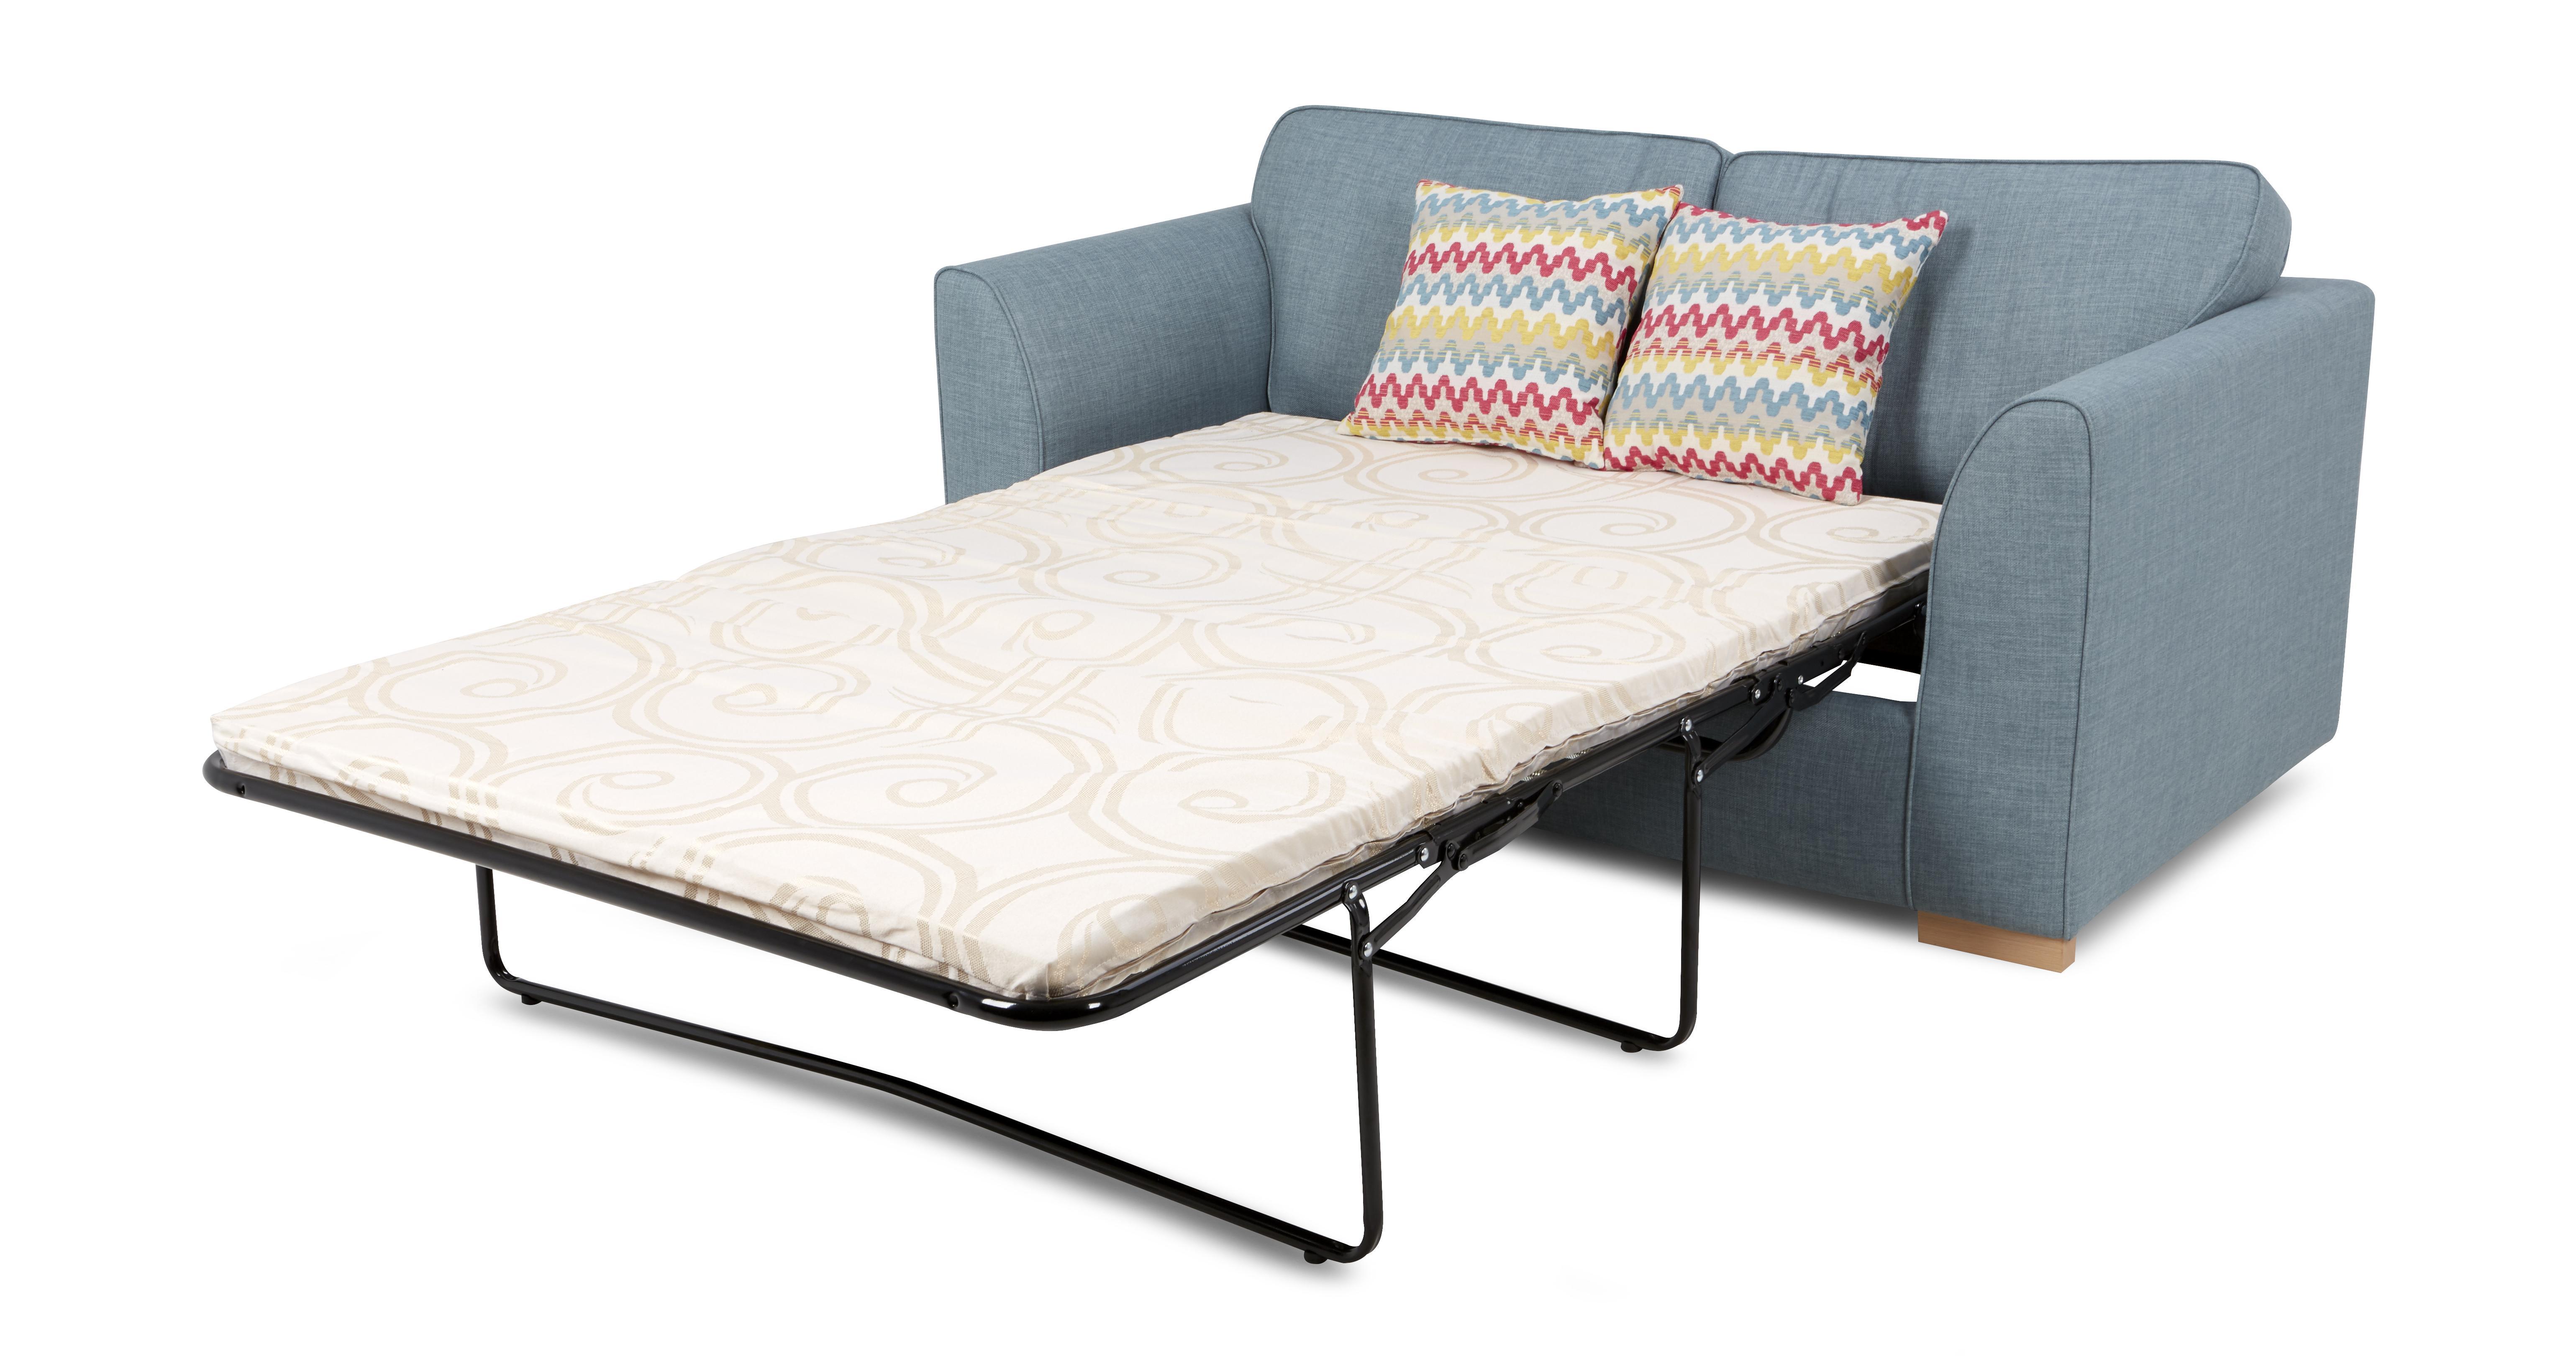 clearance sofa beds uk oak furniture land grey corner sprint 2 seater bed revive dfs